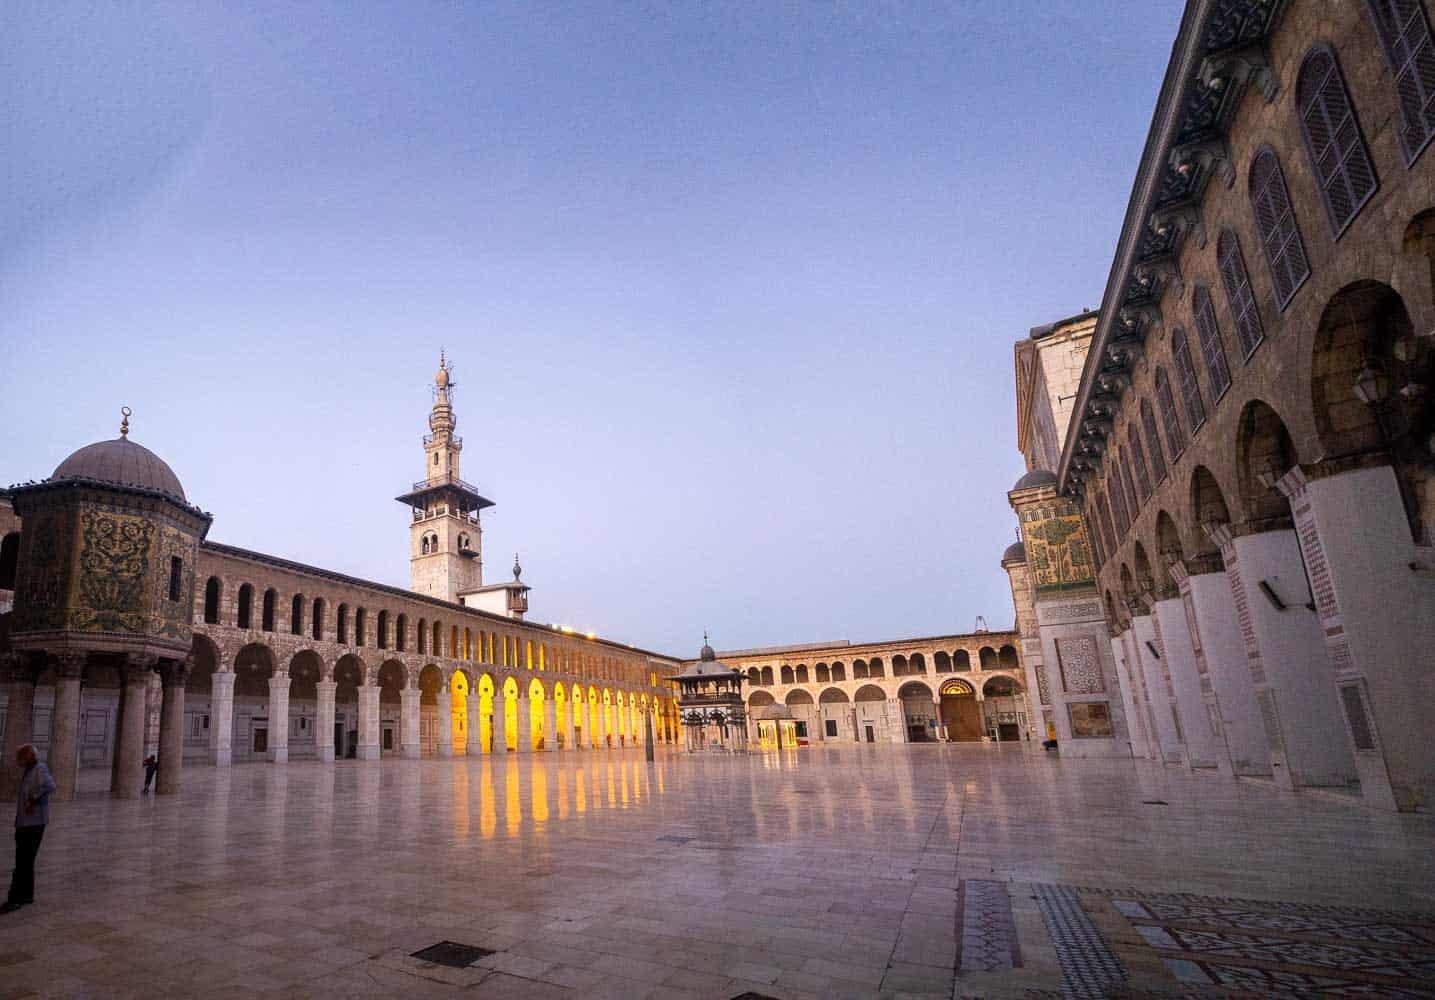 The quartyard of Umayyad Mosque